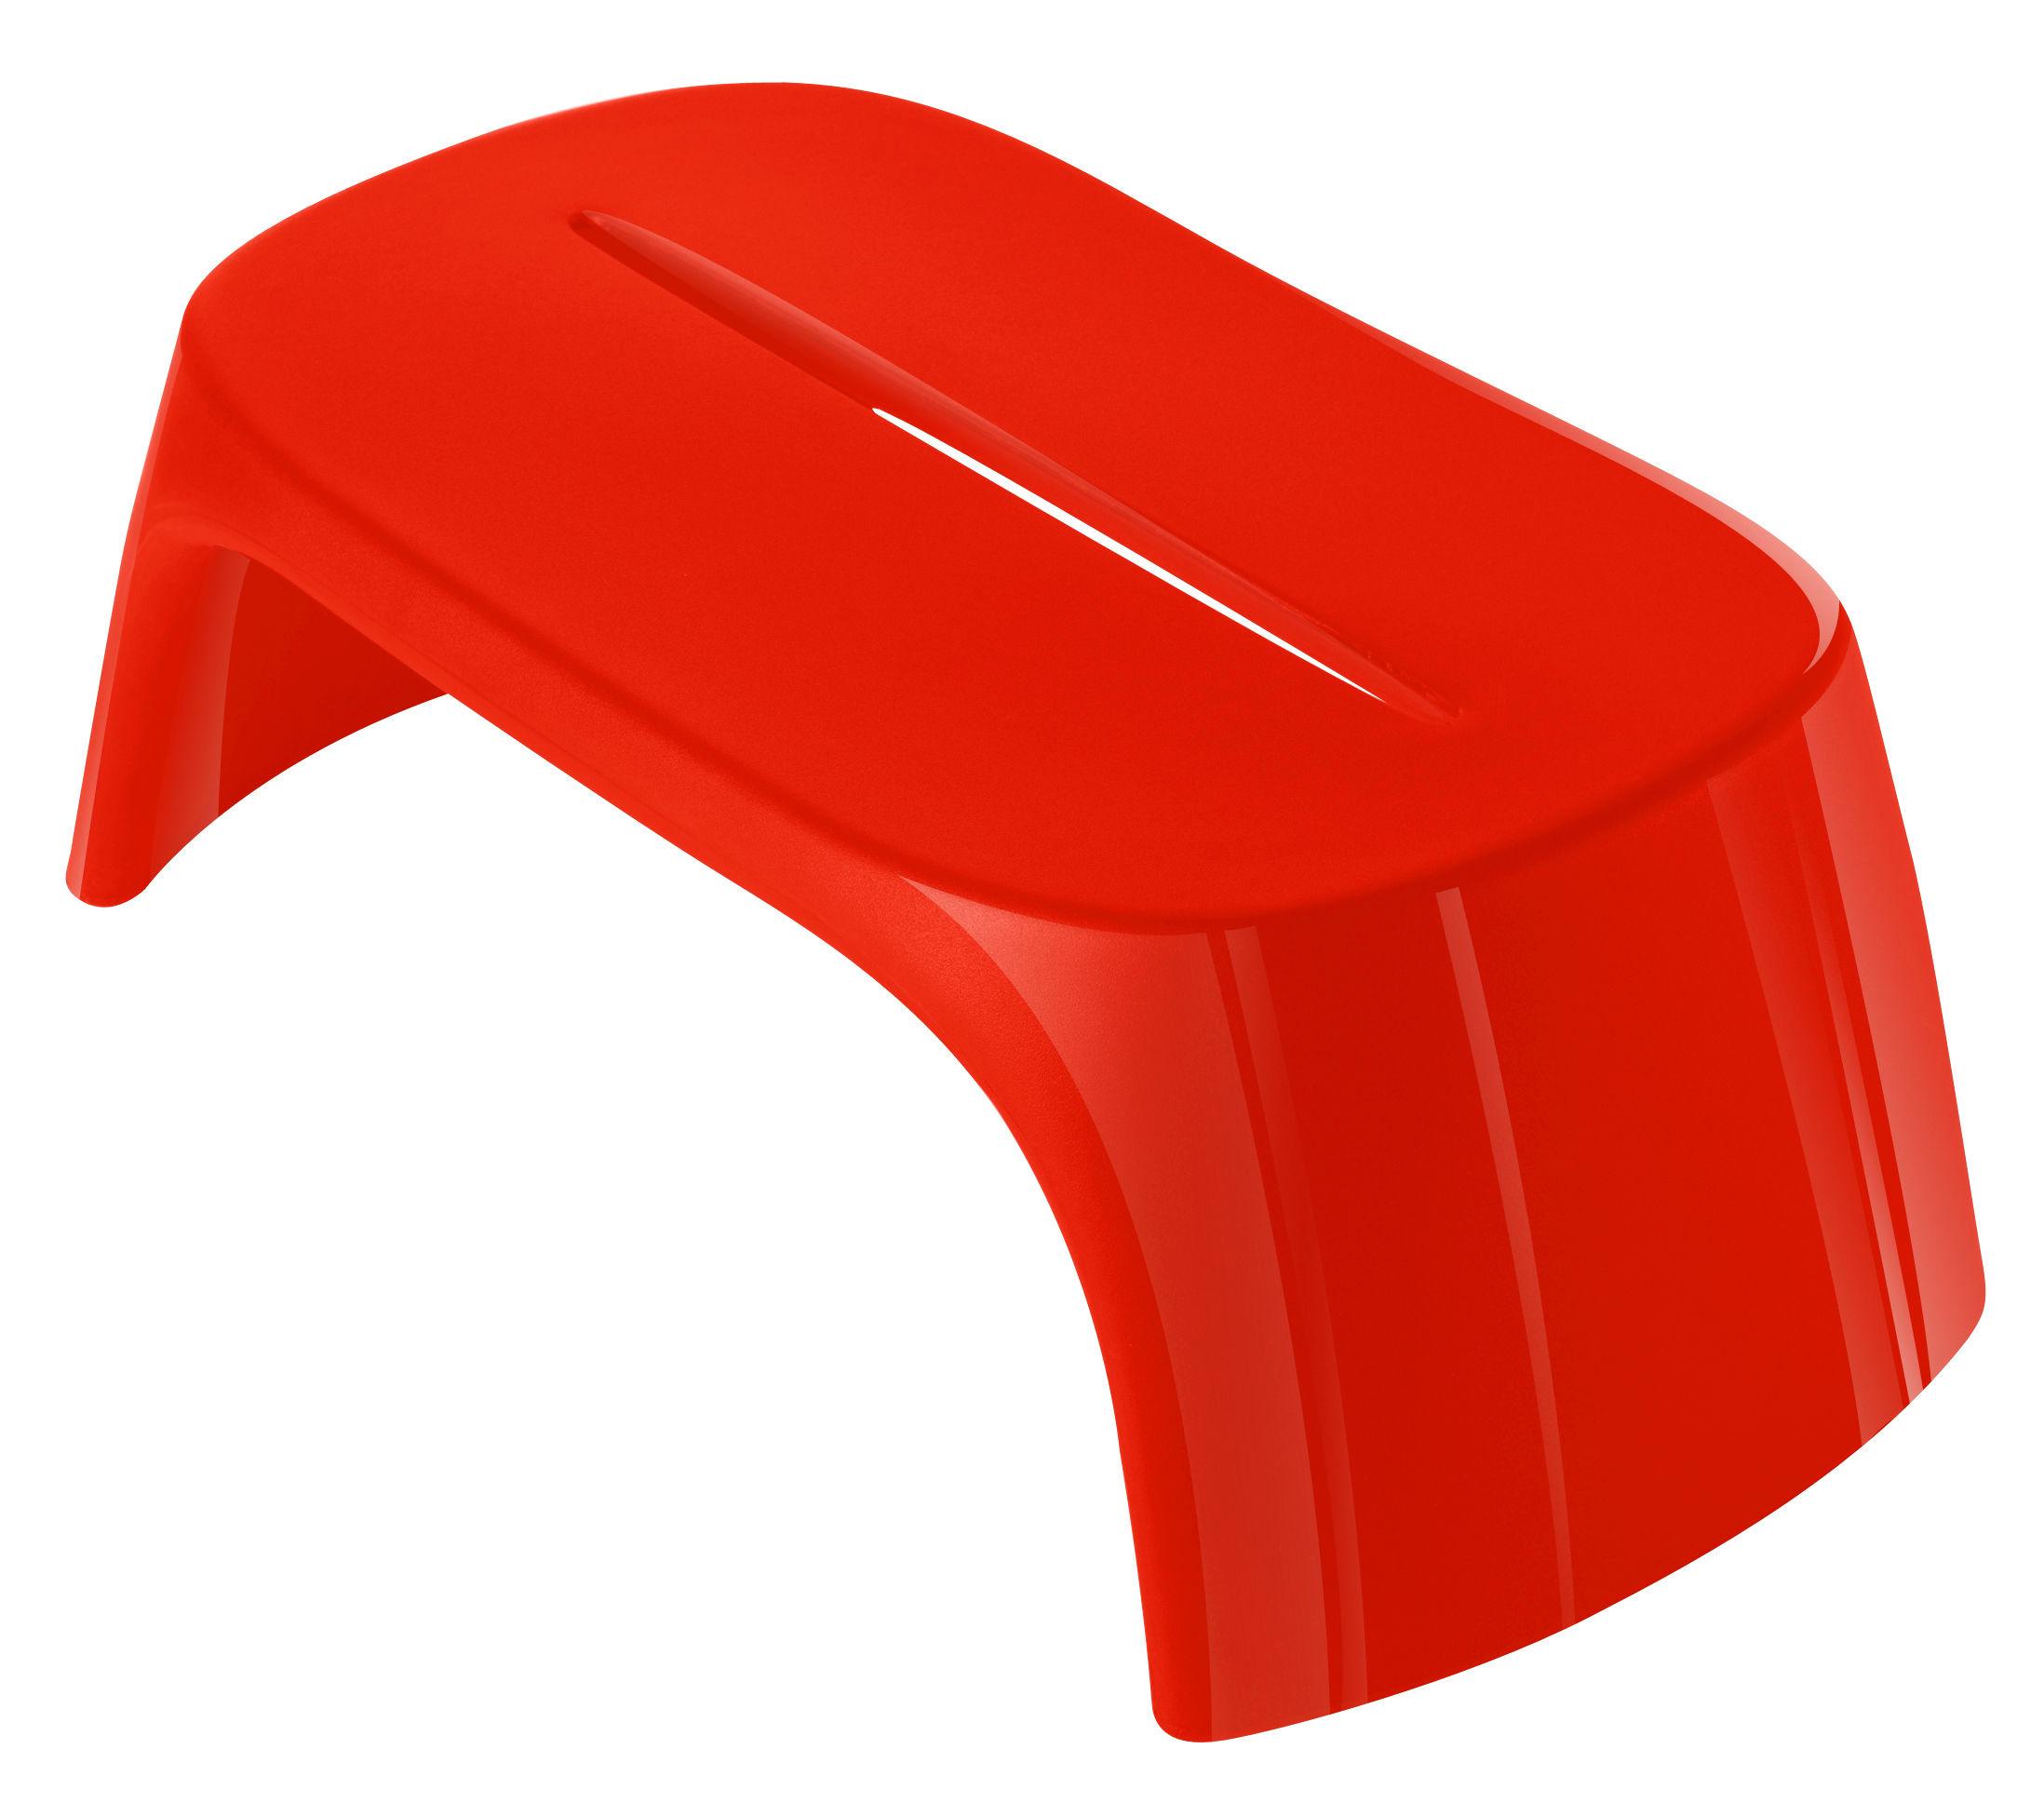 Möbel - Couchtische - Amélie Couchtisch / Bank - lackiert - Slide - Rot lackiert - Polyéthylène recyclable laqué